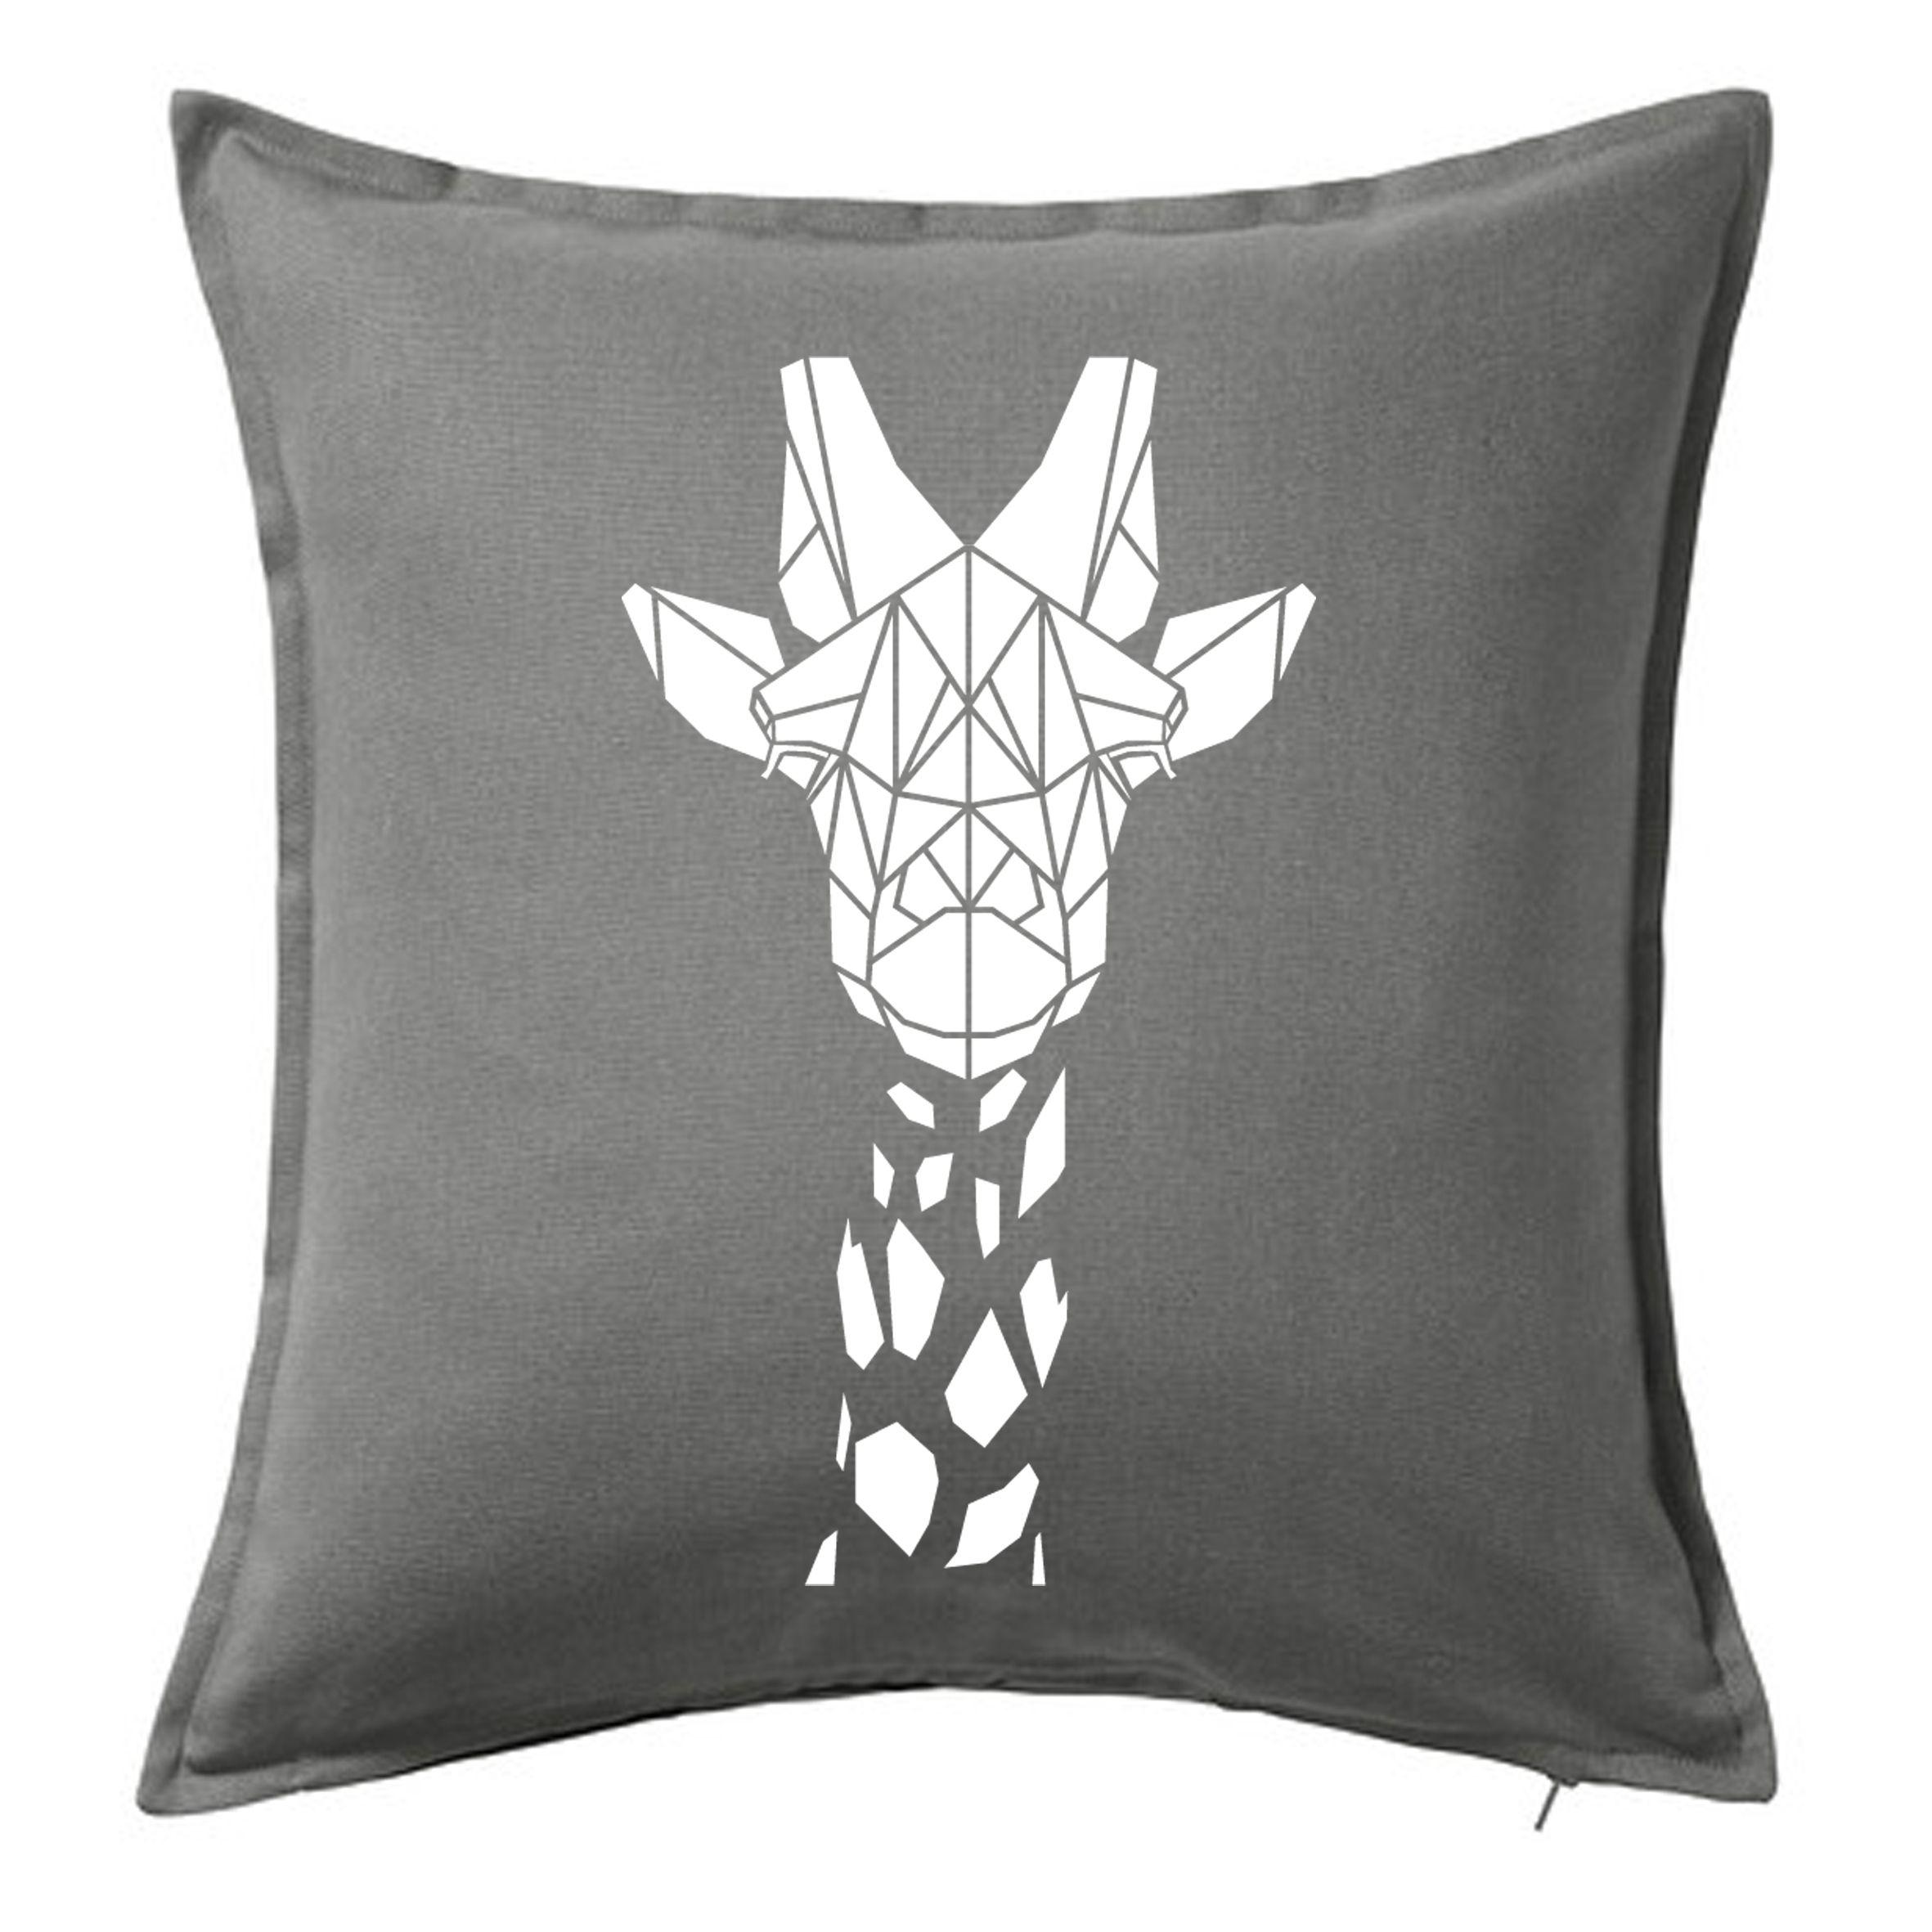 Stencilize Animal Print Cushion Cover Geometric Giraffe Print